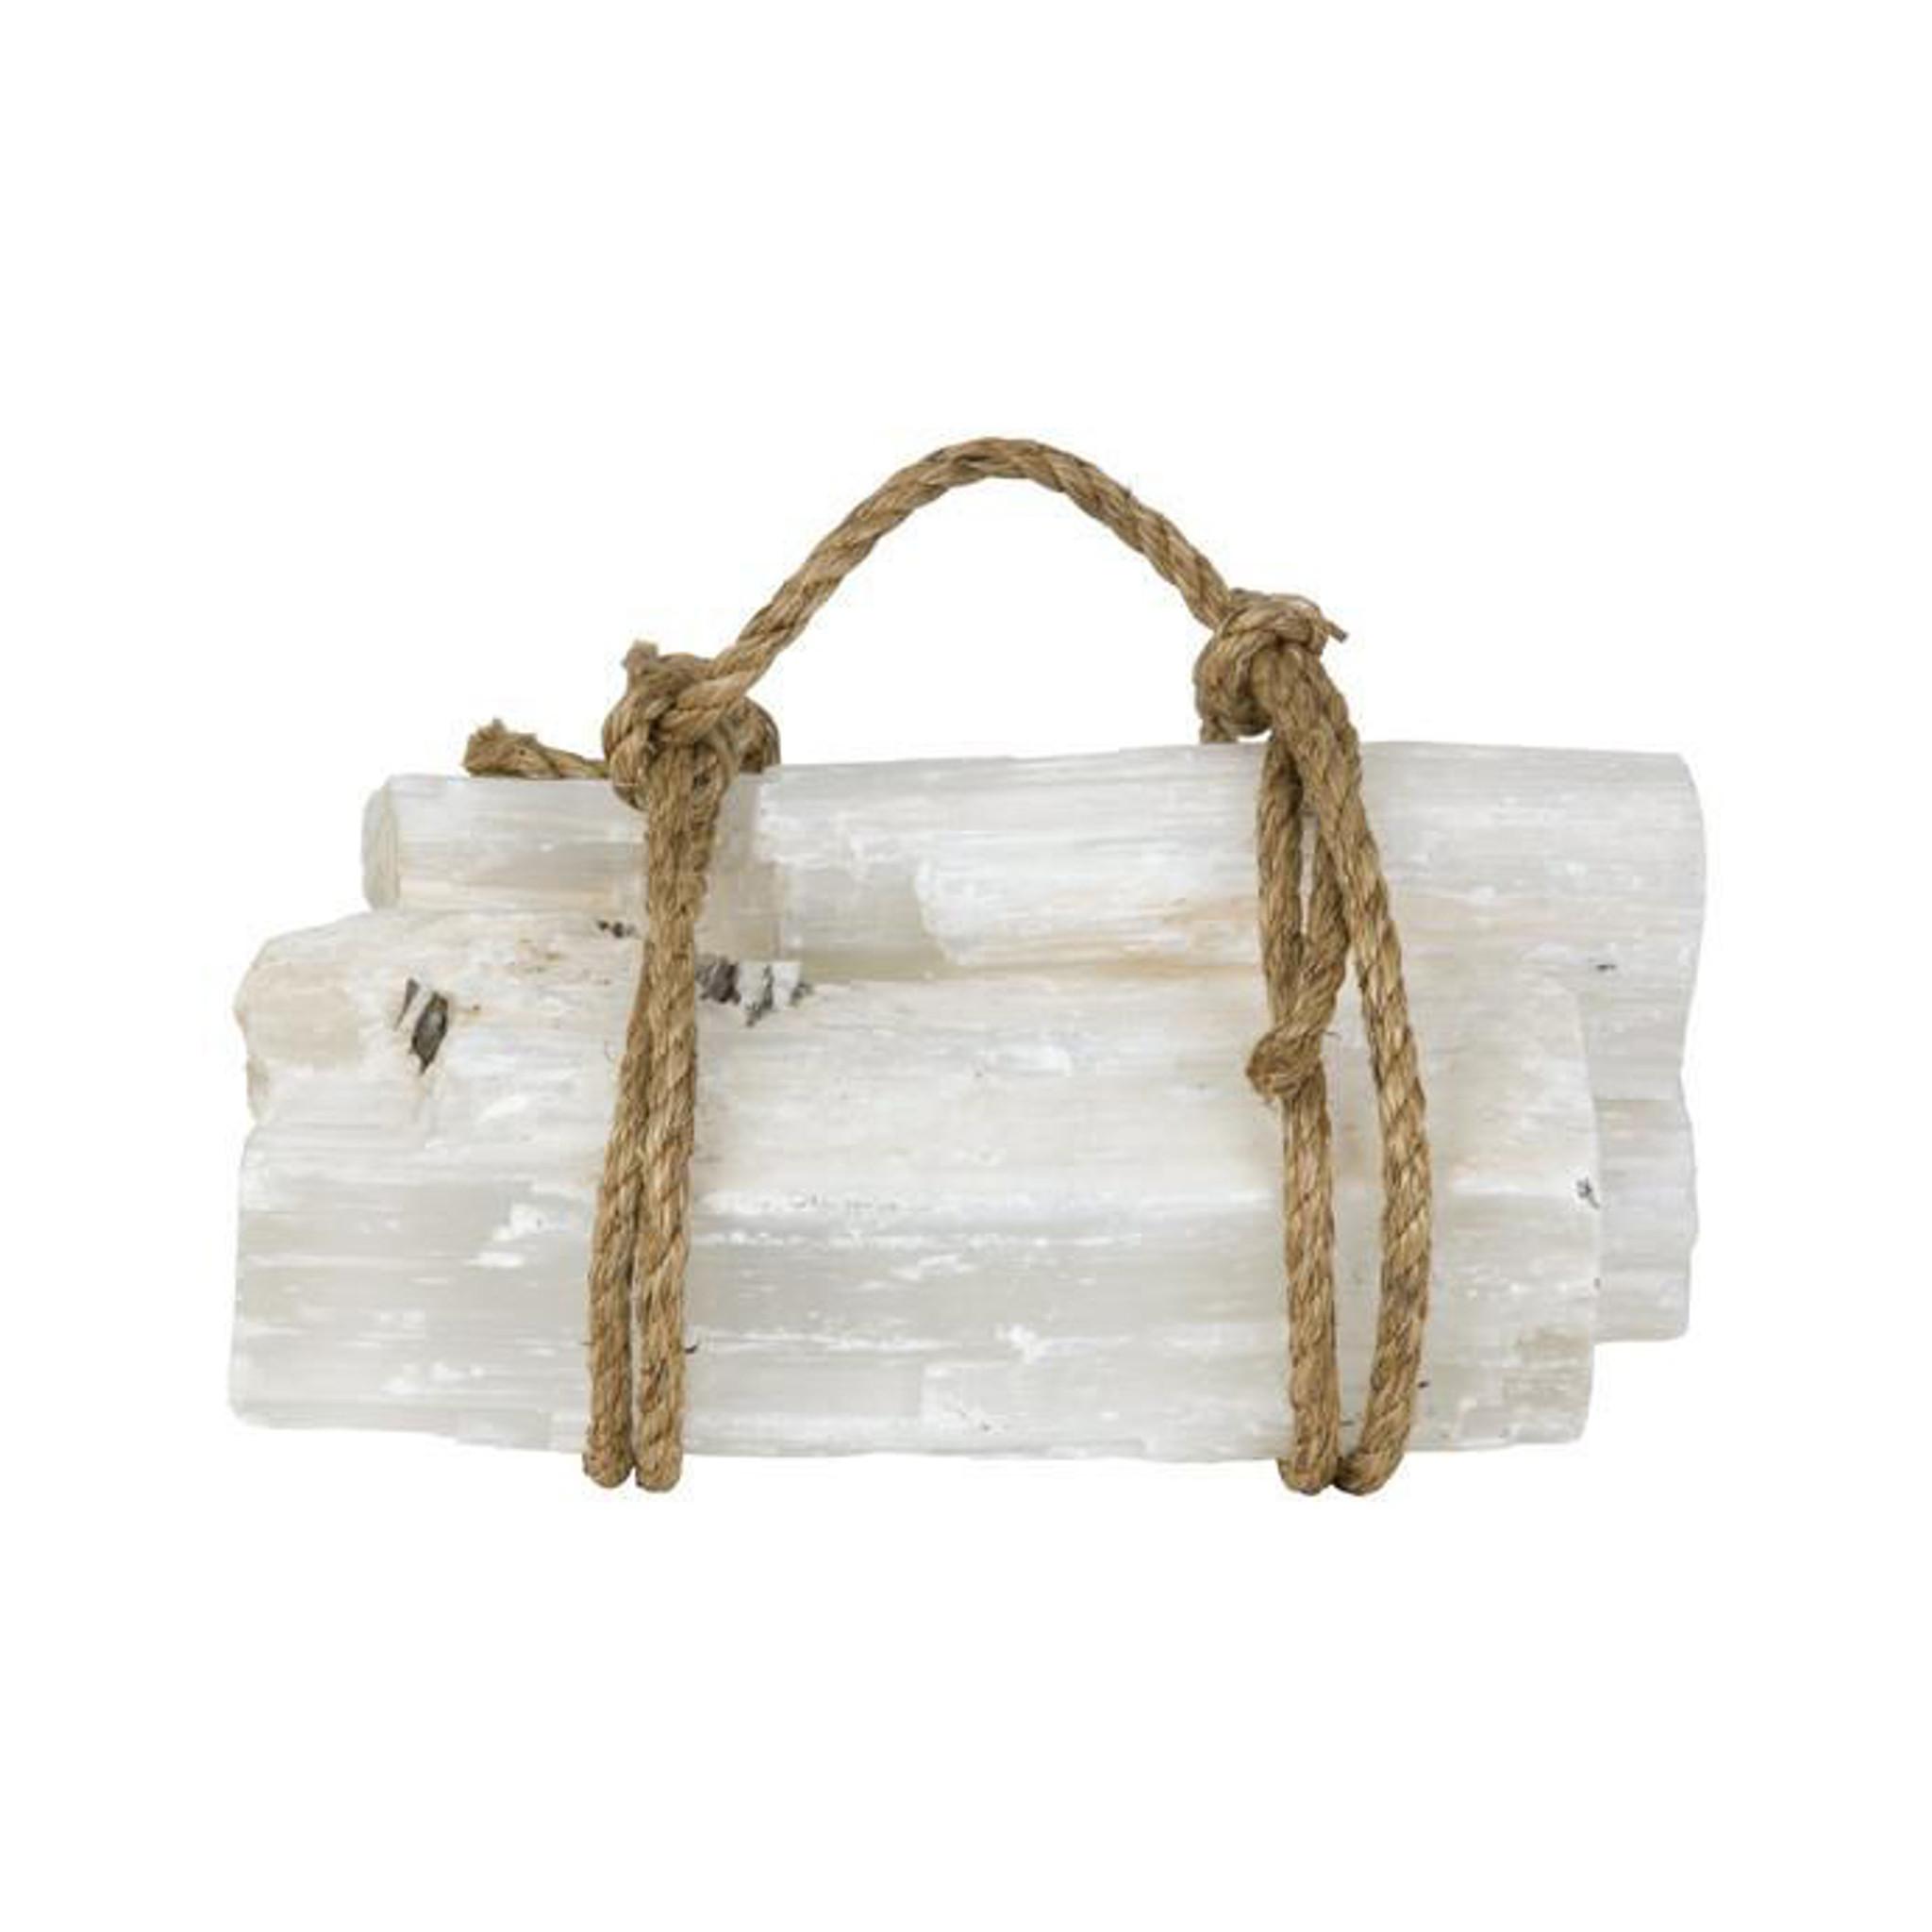 white selenite log set of 3 crystal quartz long pieces fireplace accessory